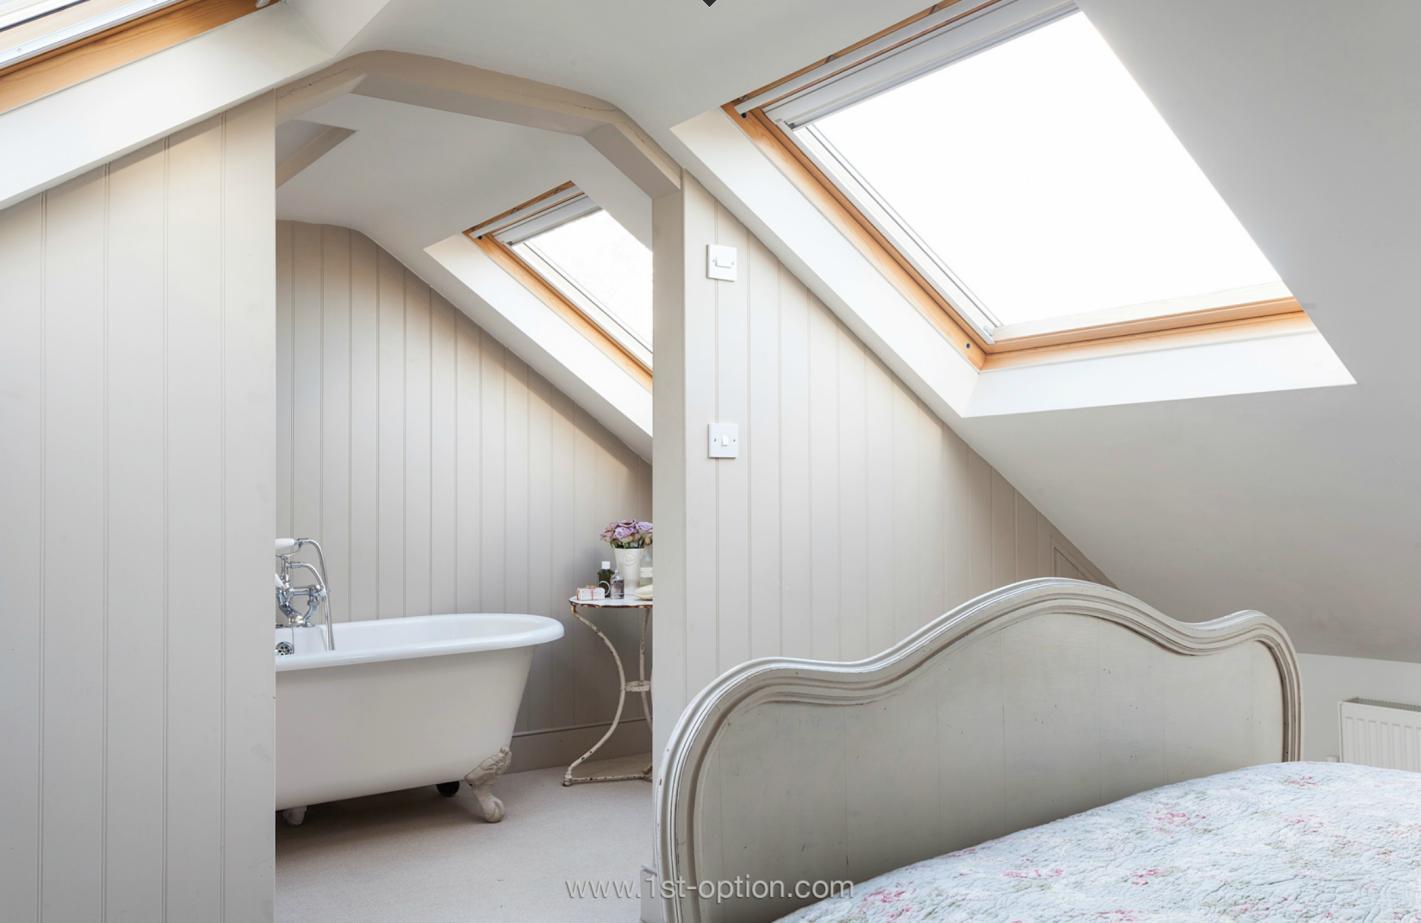 Ensuite badezimmerdesign loft conversion bedroom with en suite  the best attic home design